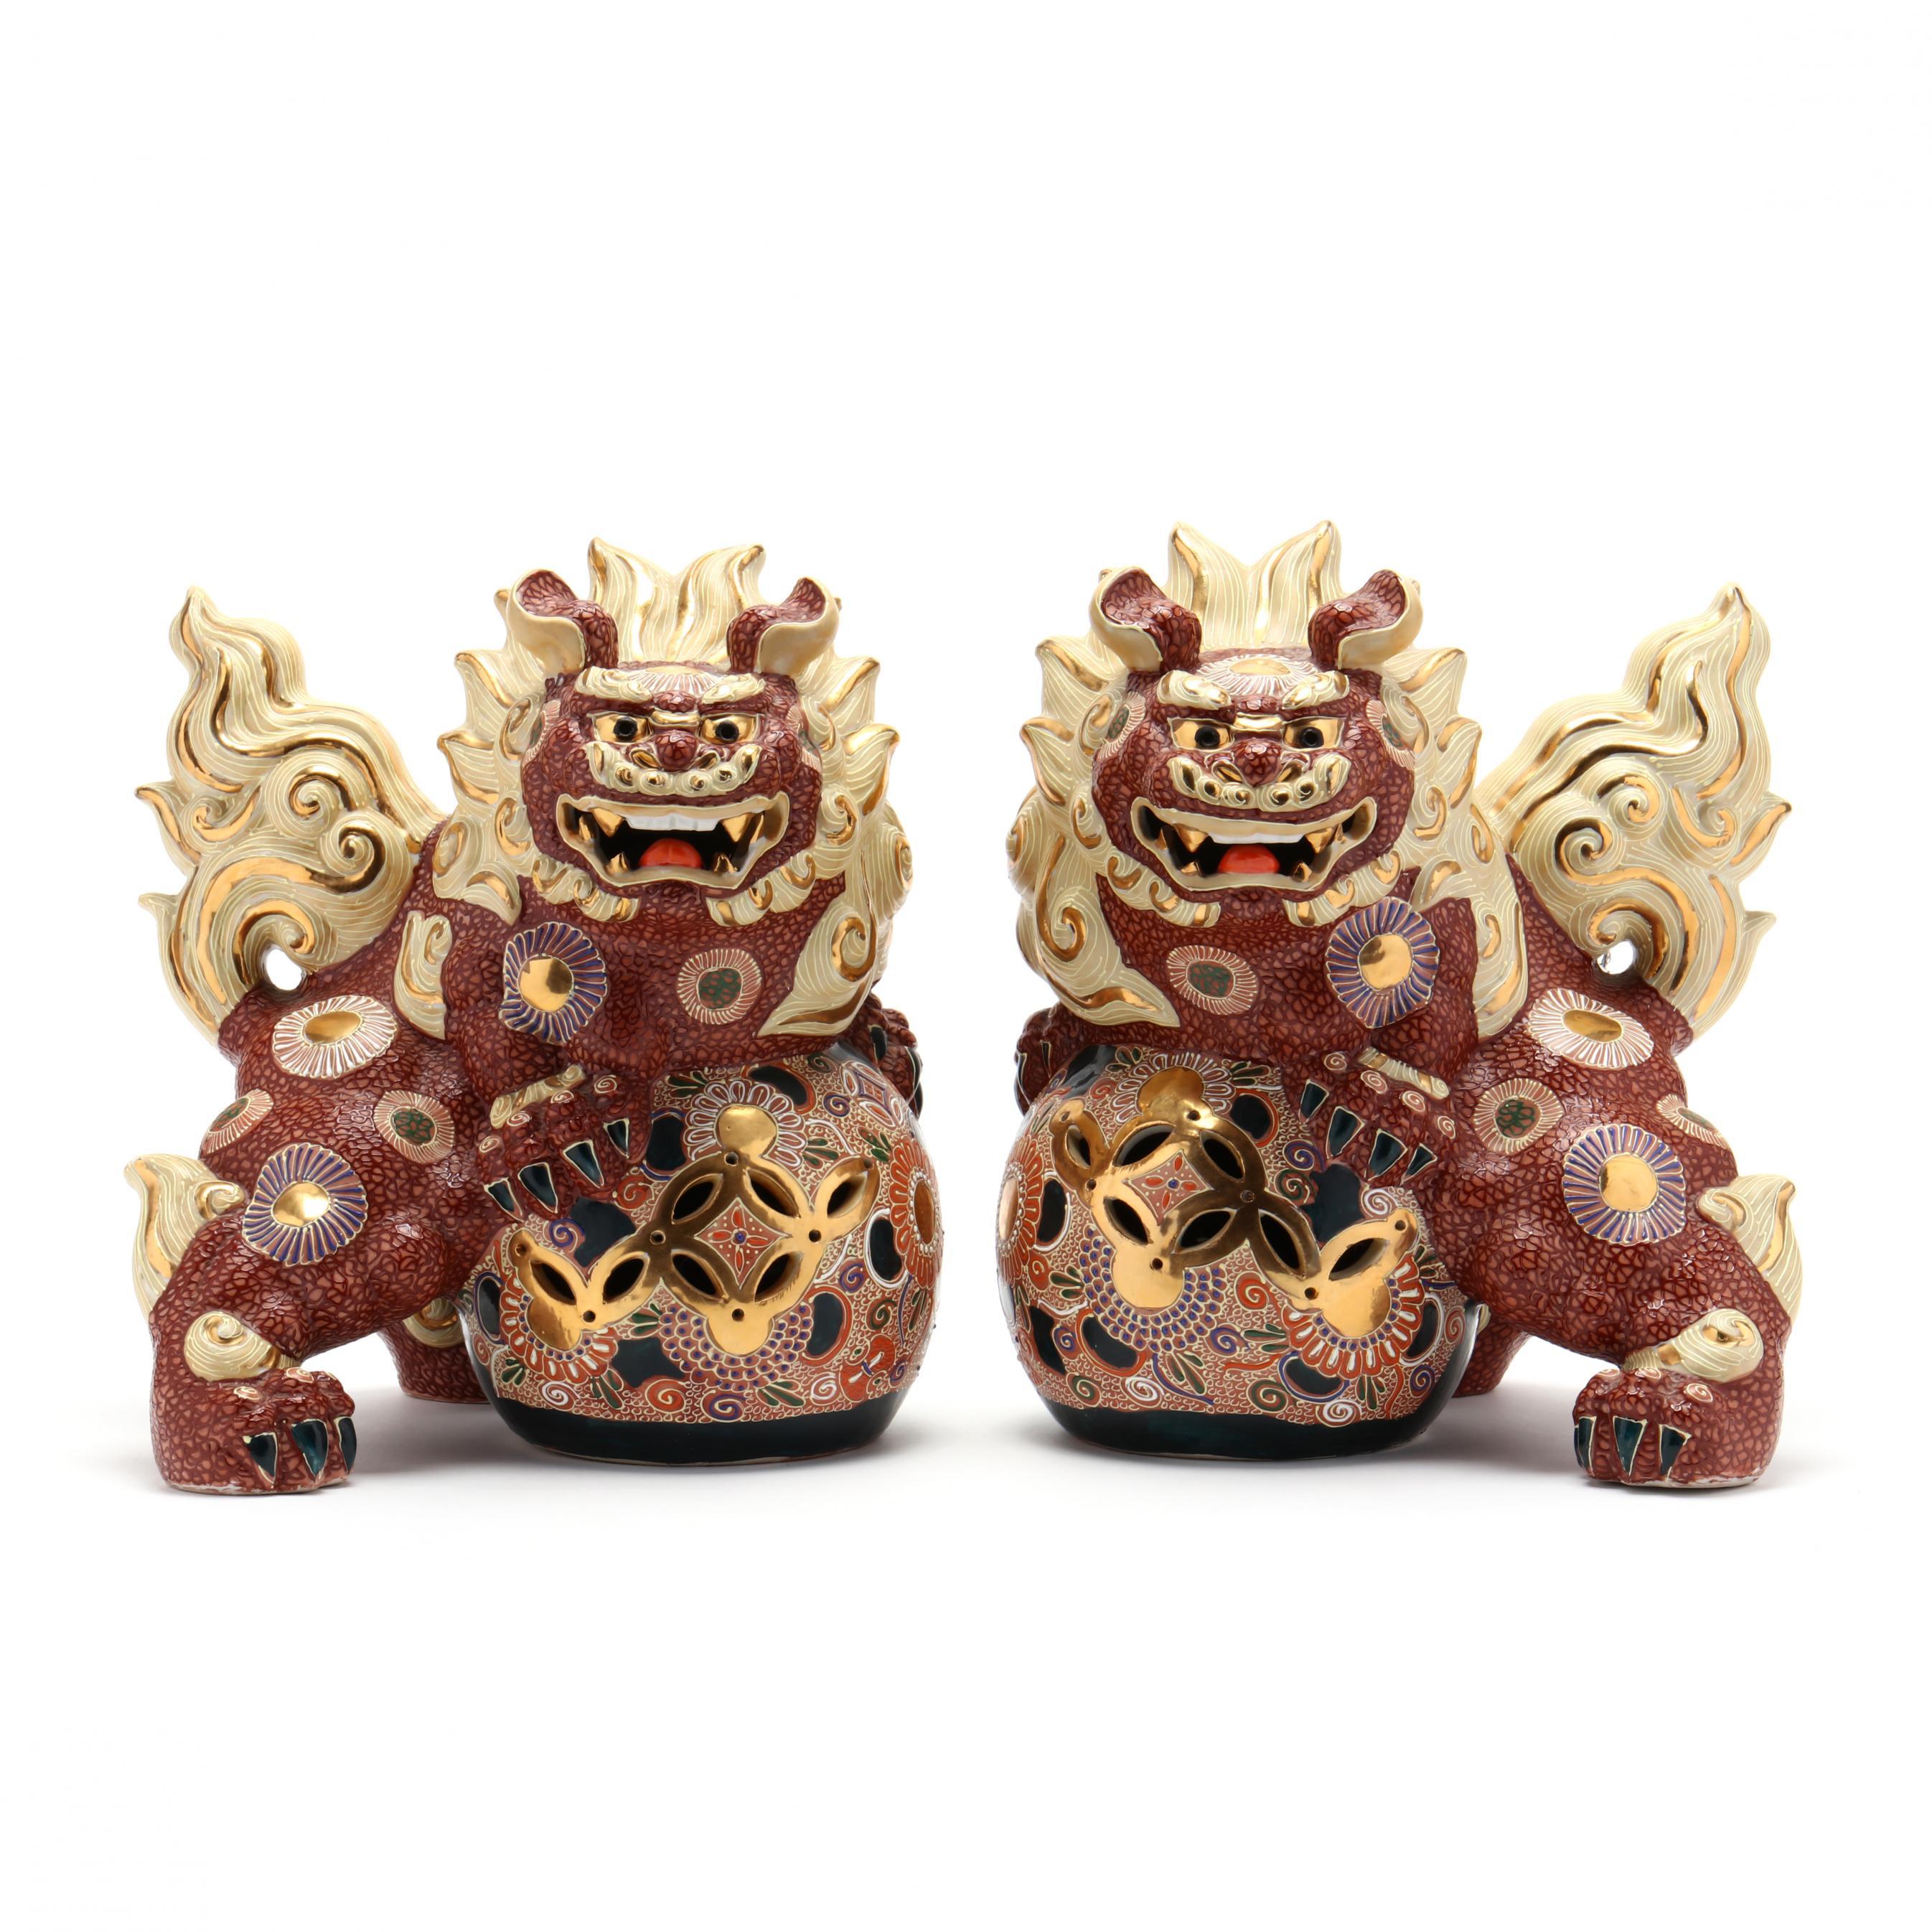 a-pair-of-japanese-kutani-satsuma-porcelain-foo-dogs